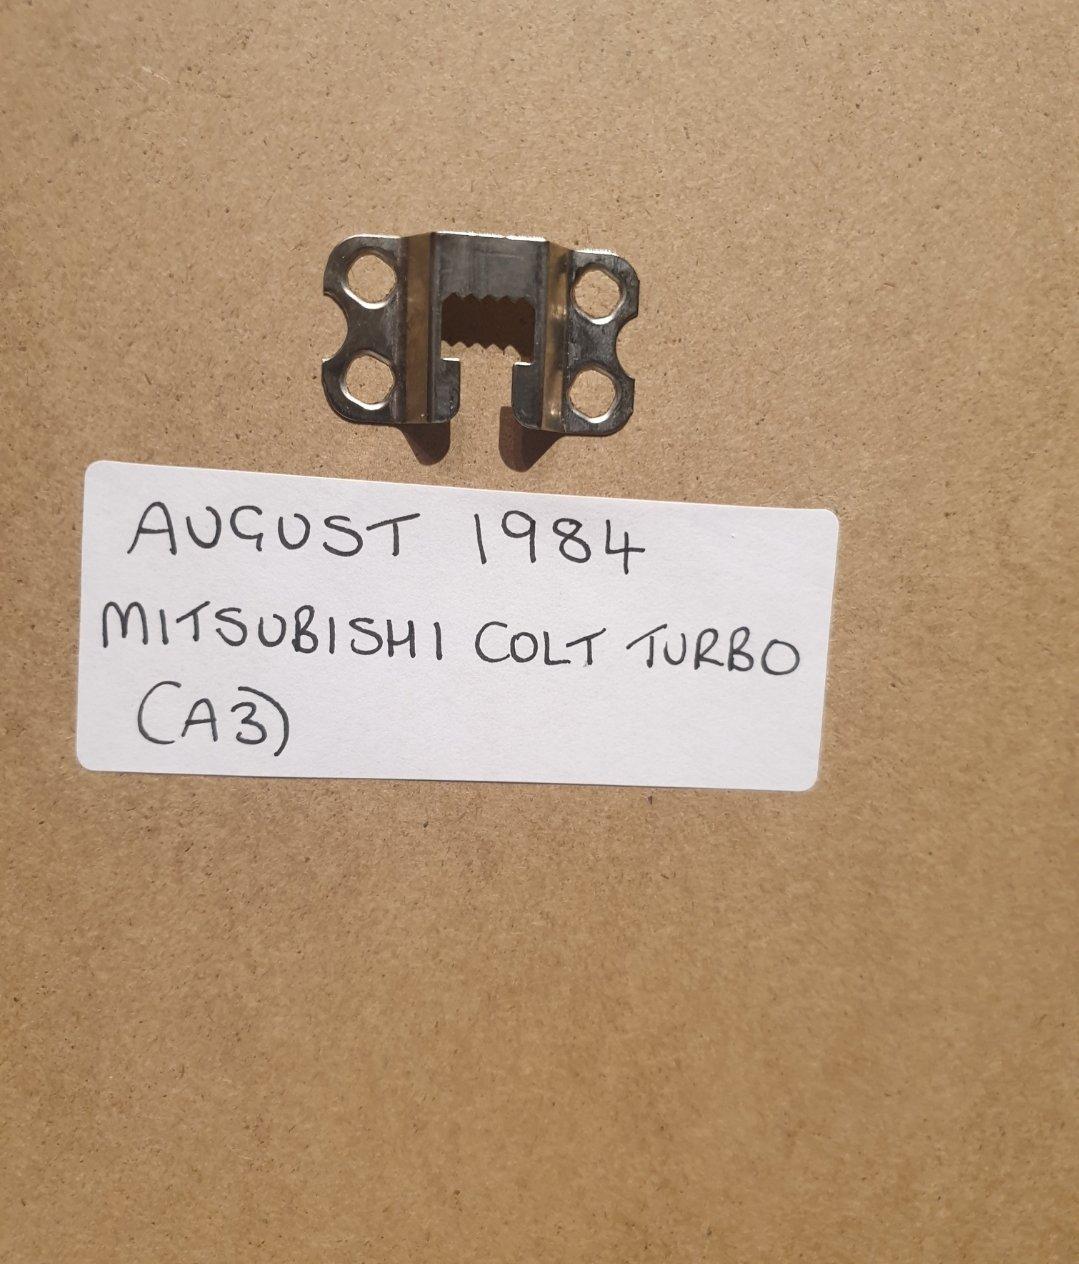 1984 Mitsubishi Colt Turbo Advert Original  For Sale (picture 2 of 2)